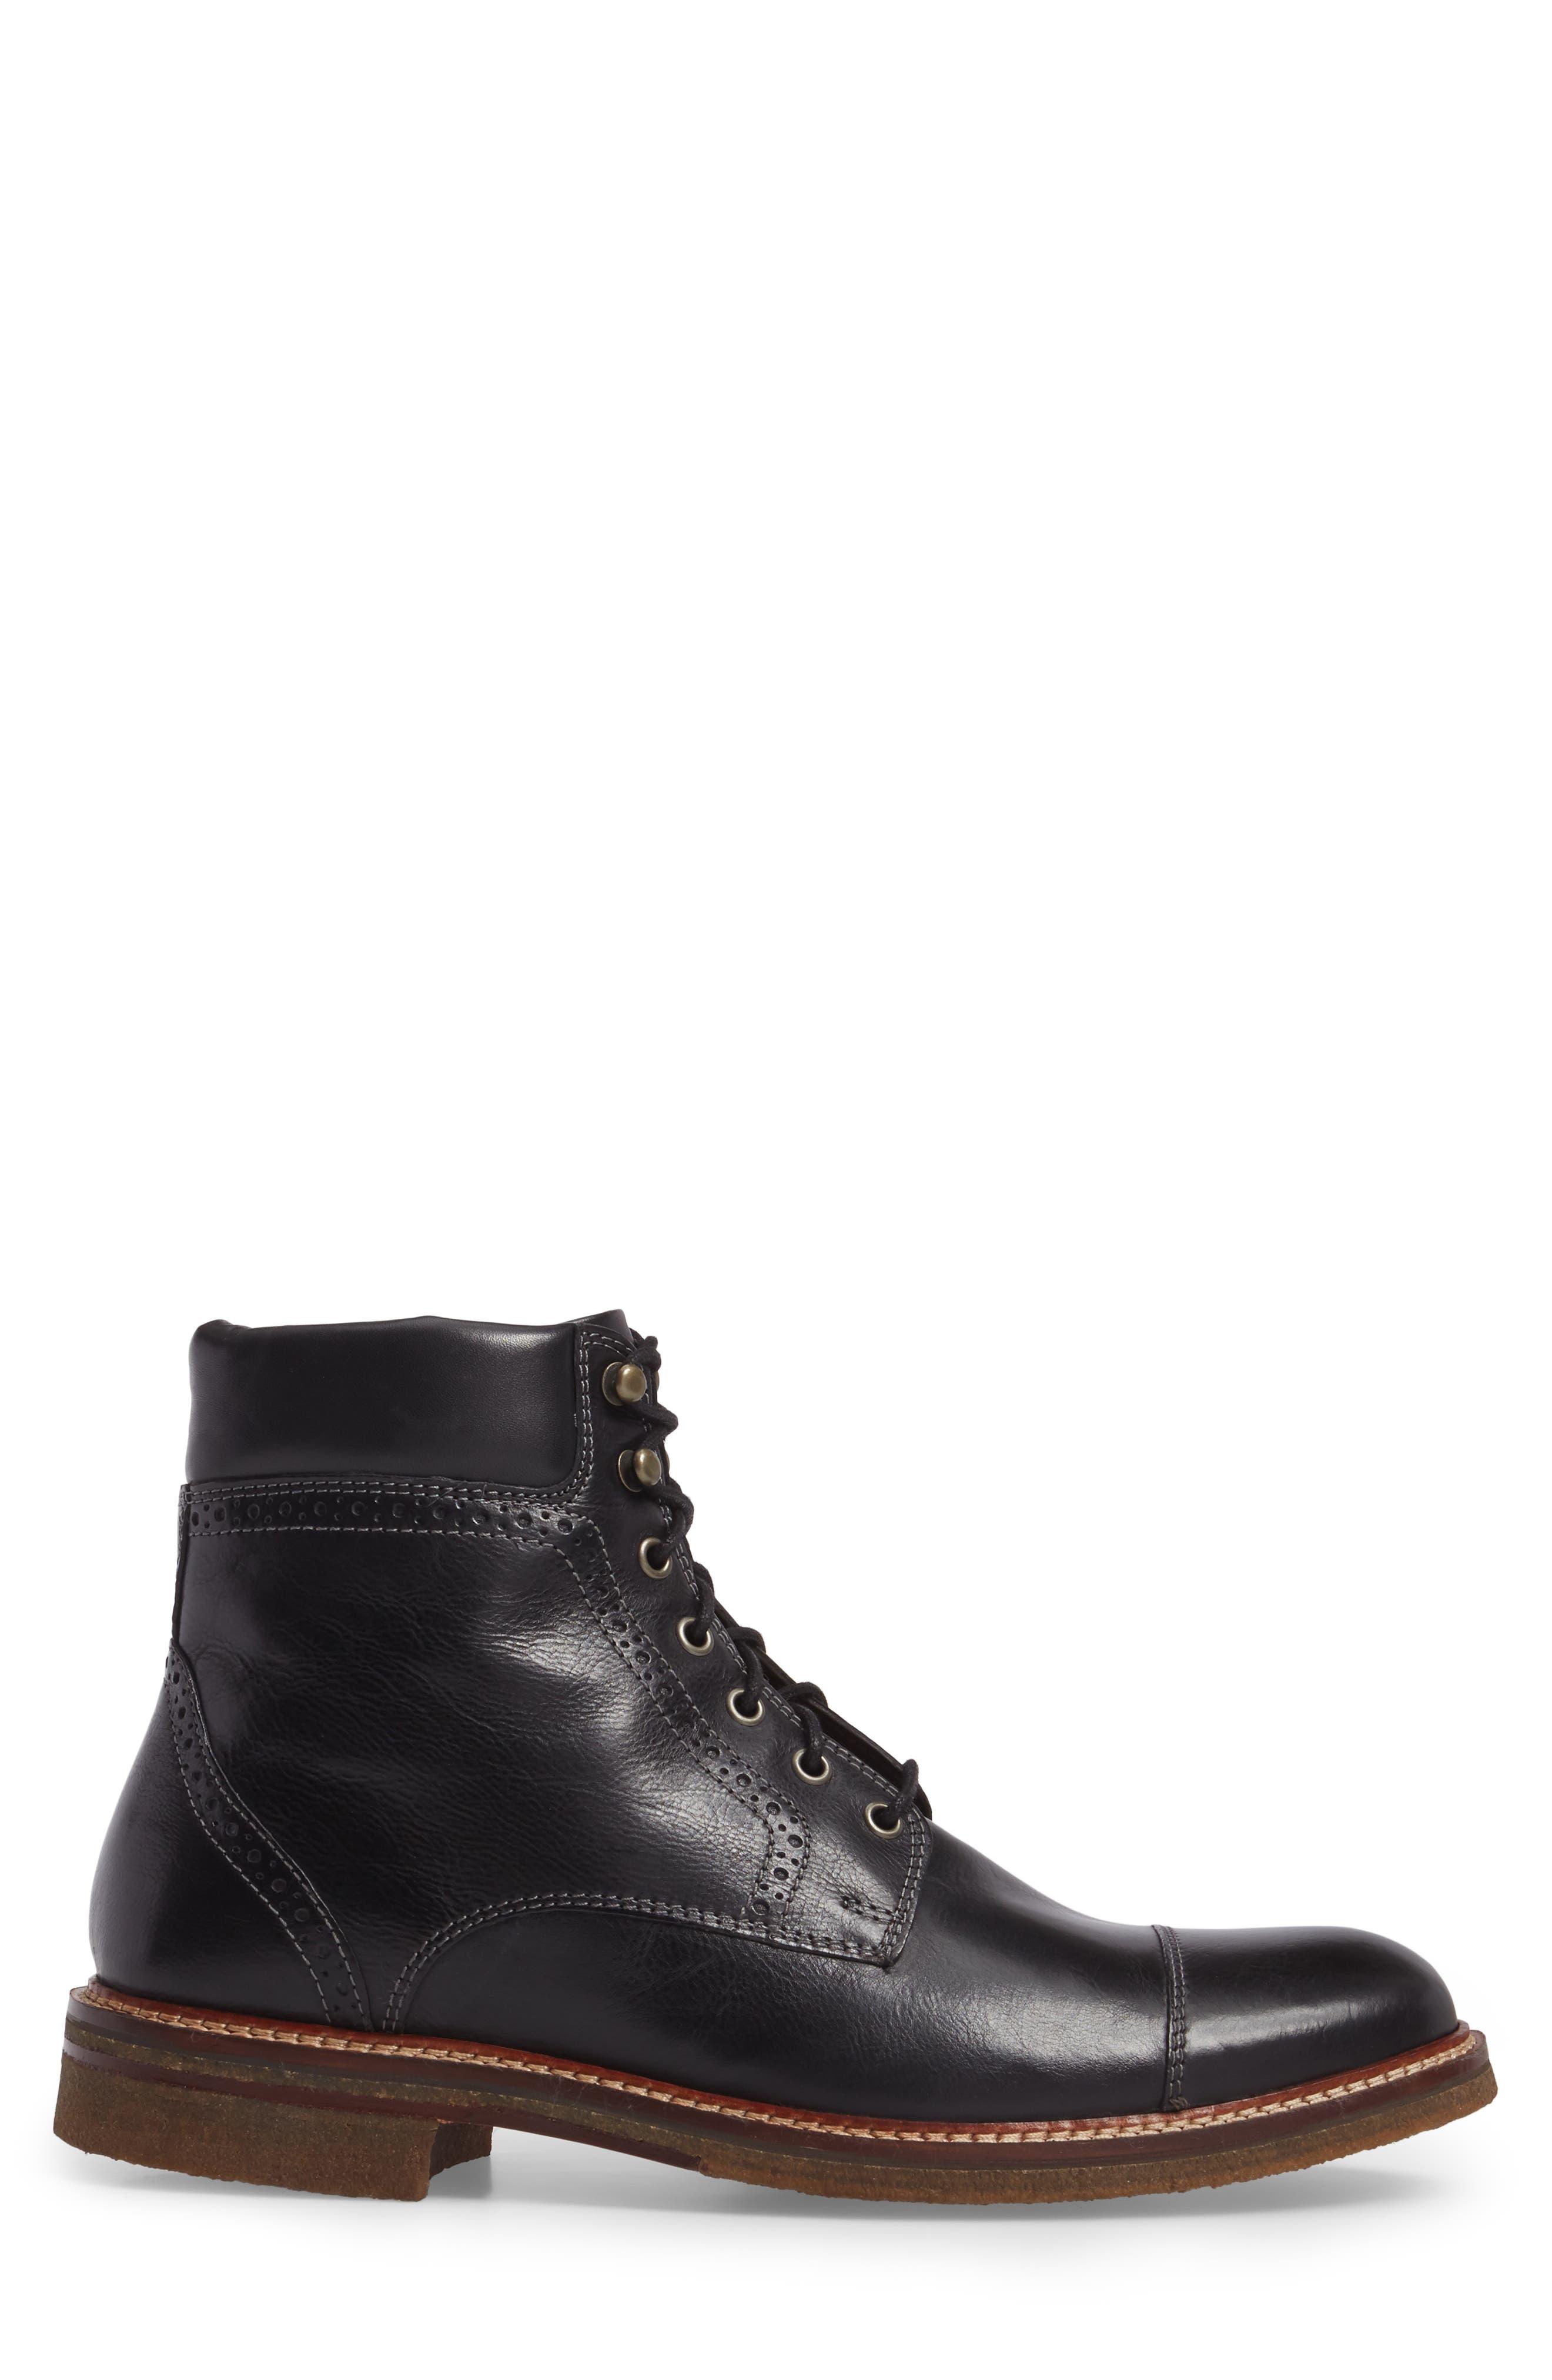 Forrester Cap Toe Boot,                             Alternate thumbnail 3, color,                             BLACK LEATHER